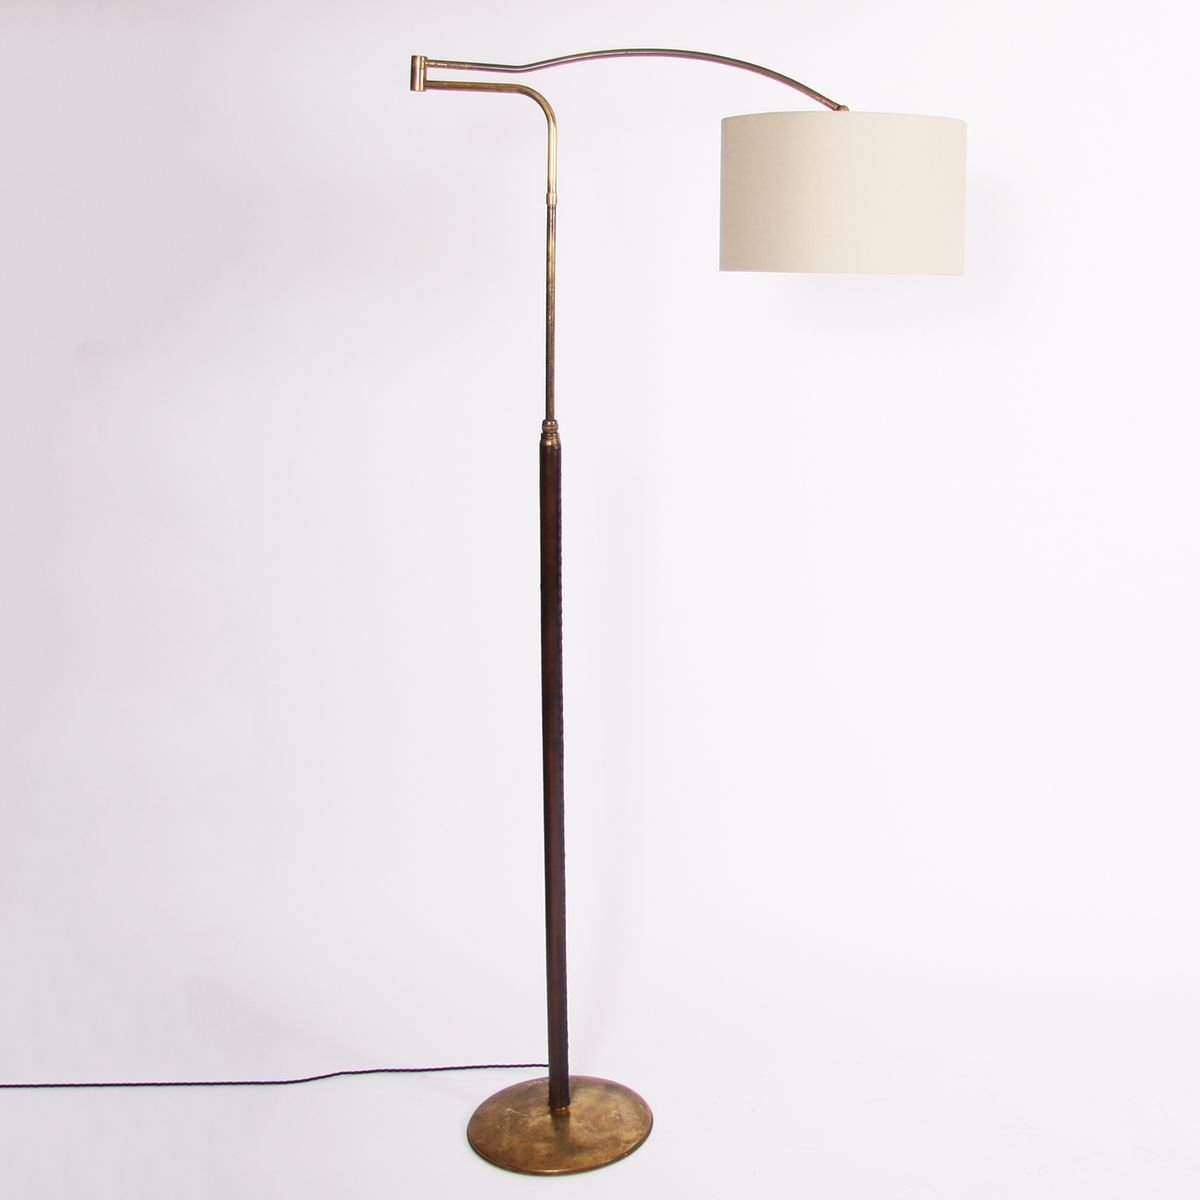 Hohe lederbezogene Stehlampe aus Messing mit Dreharm, 1950er